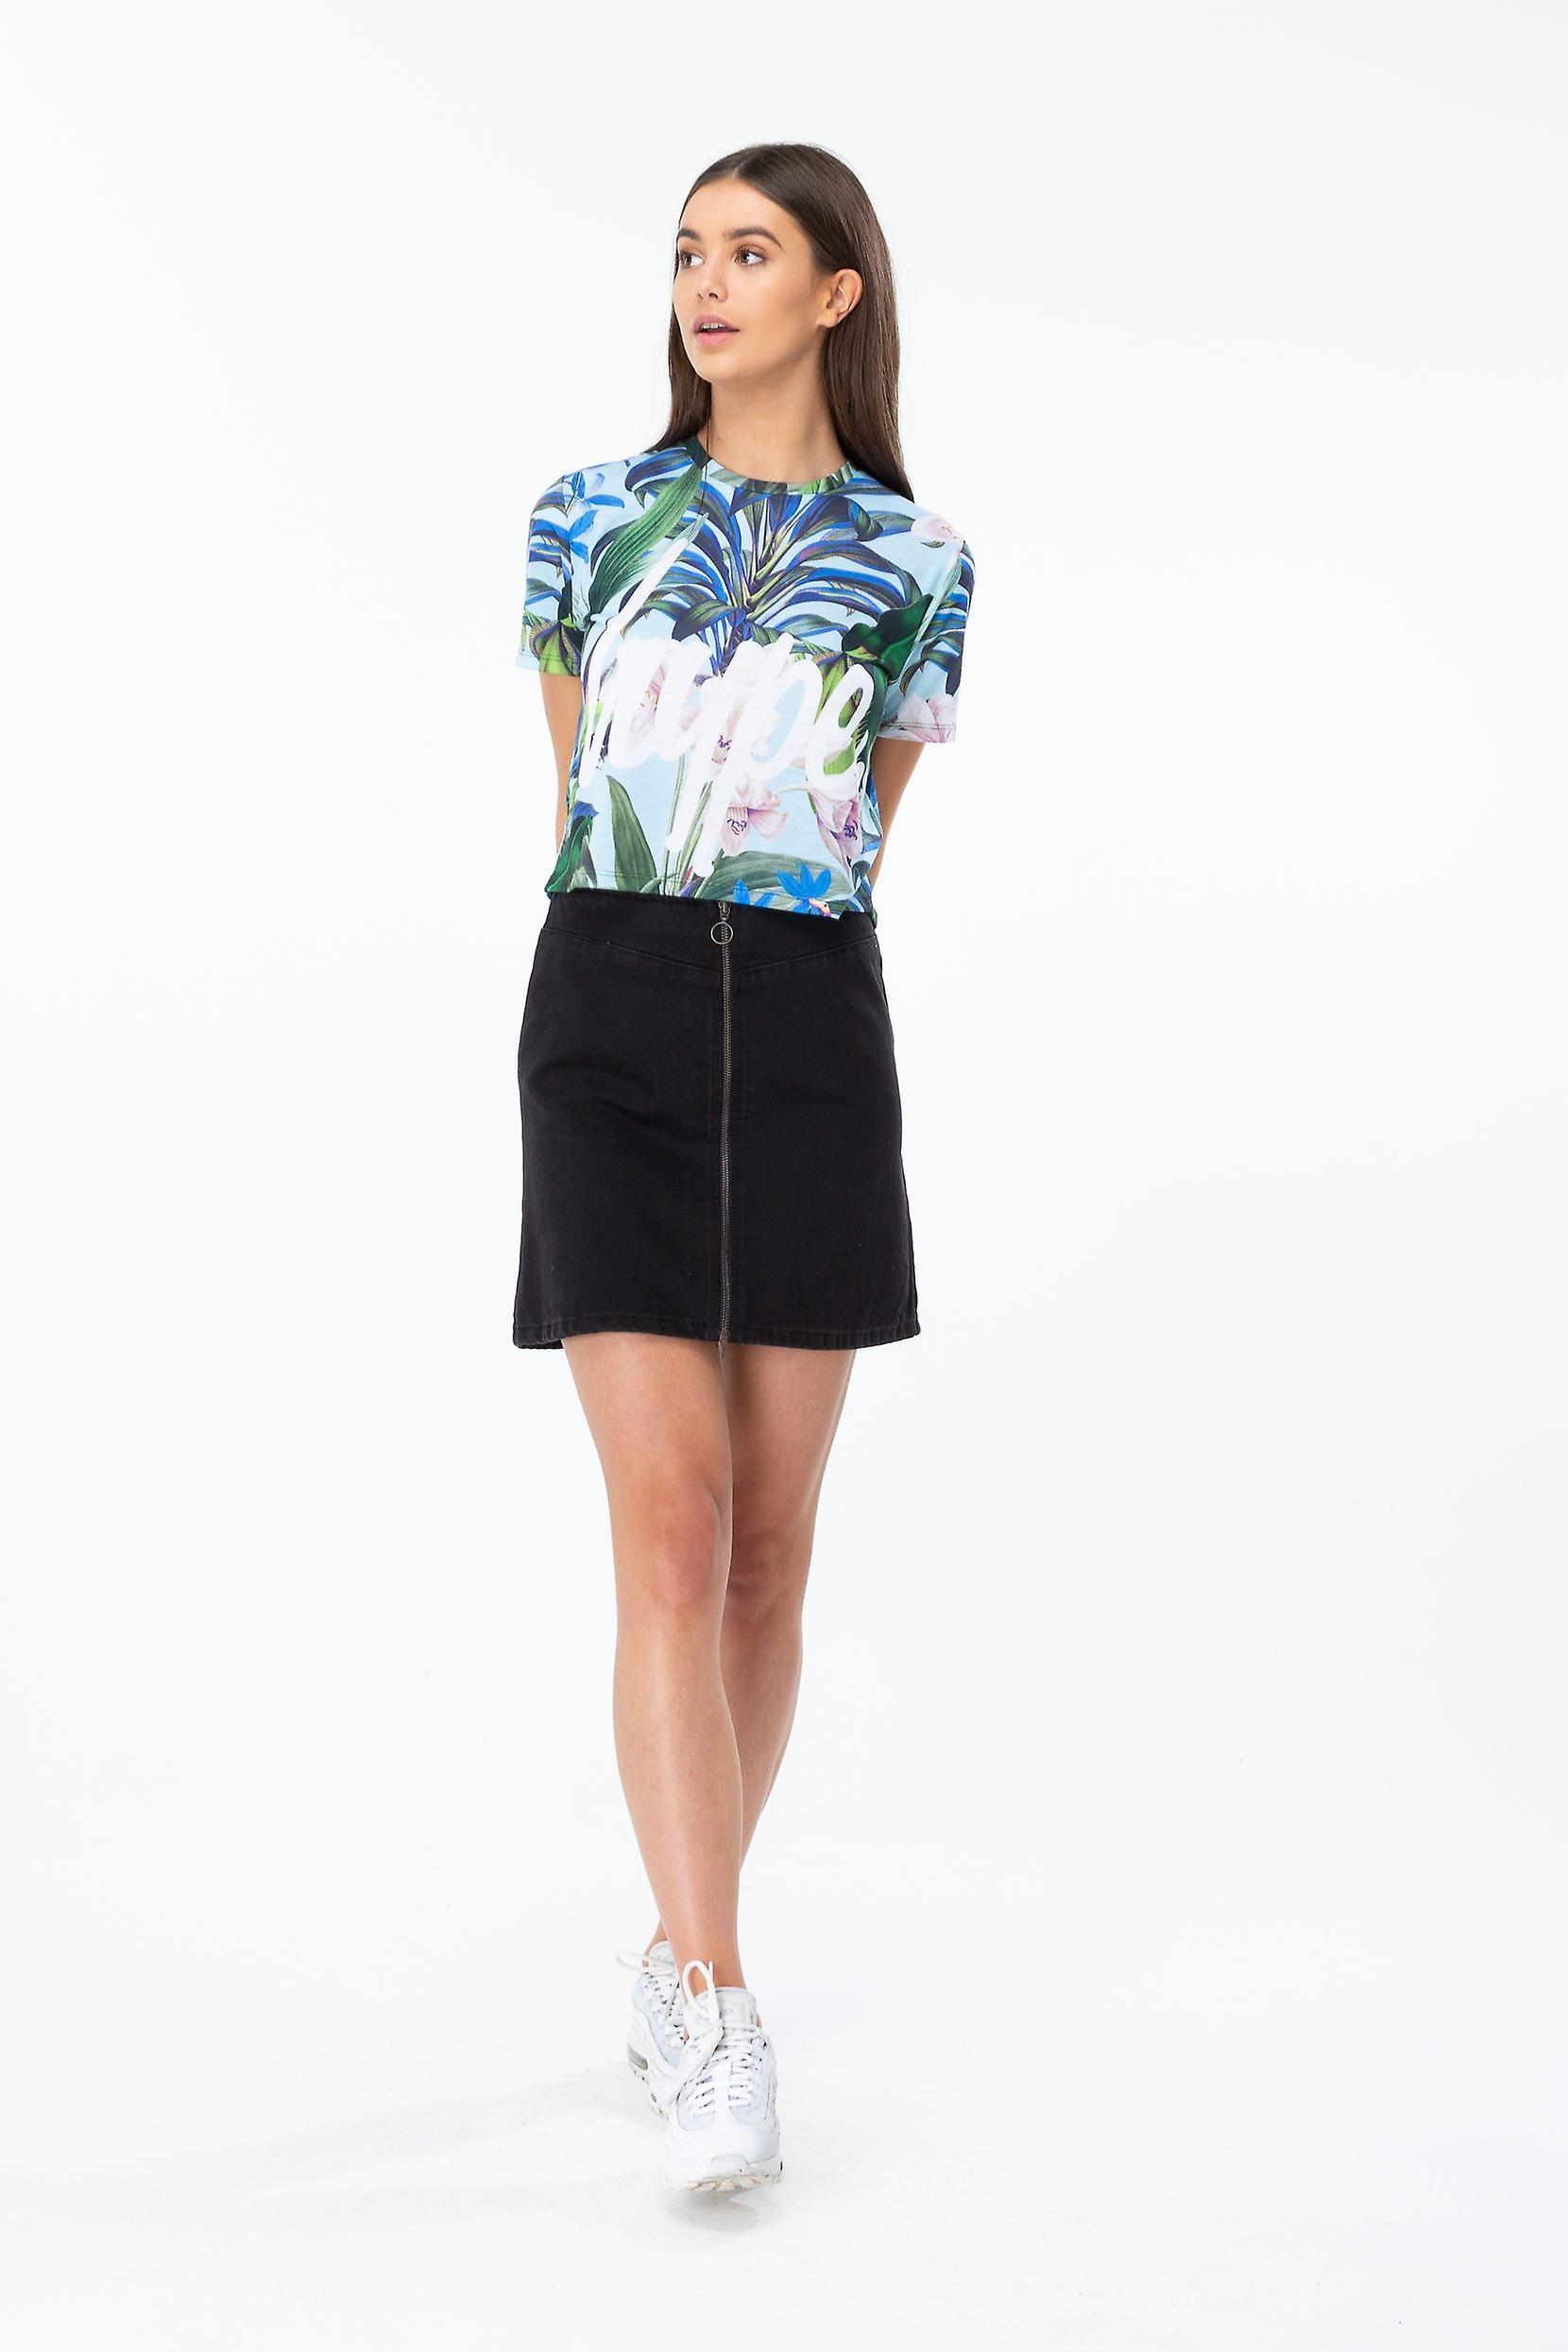 Hype Tropics Script Women's Crop T-Shirt